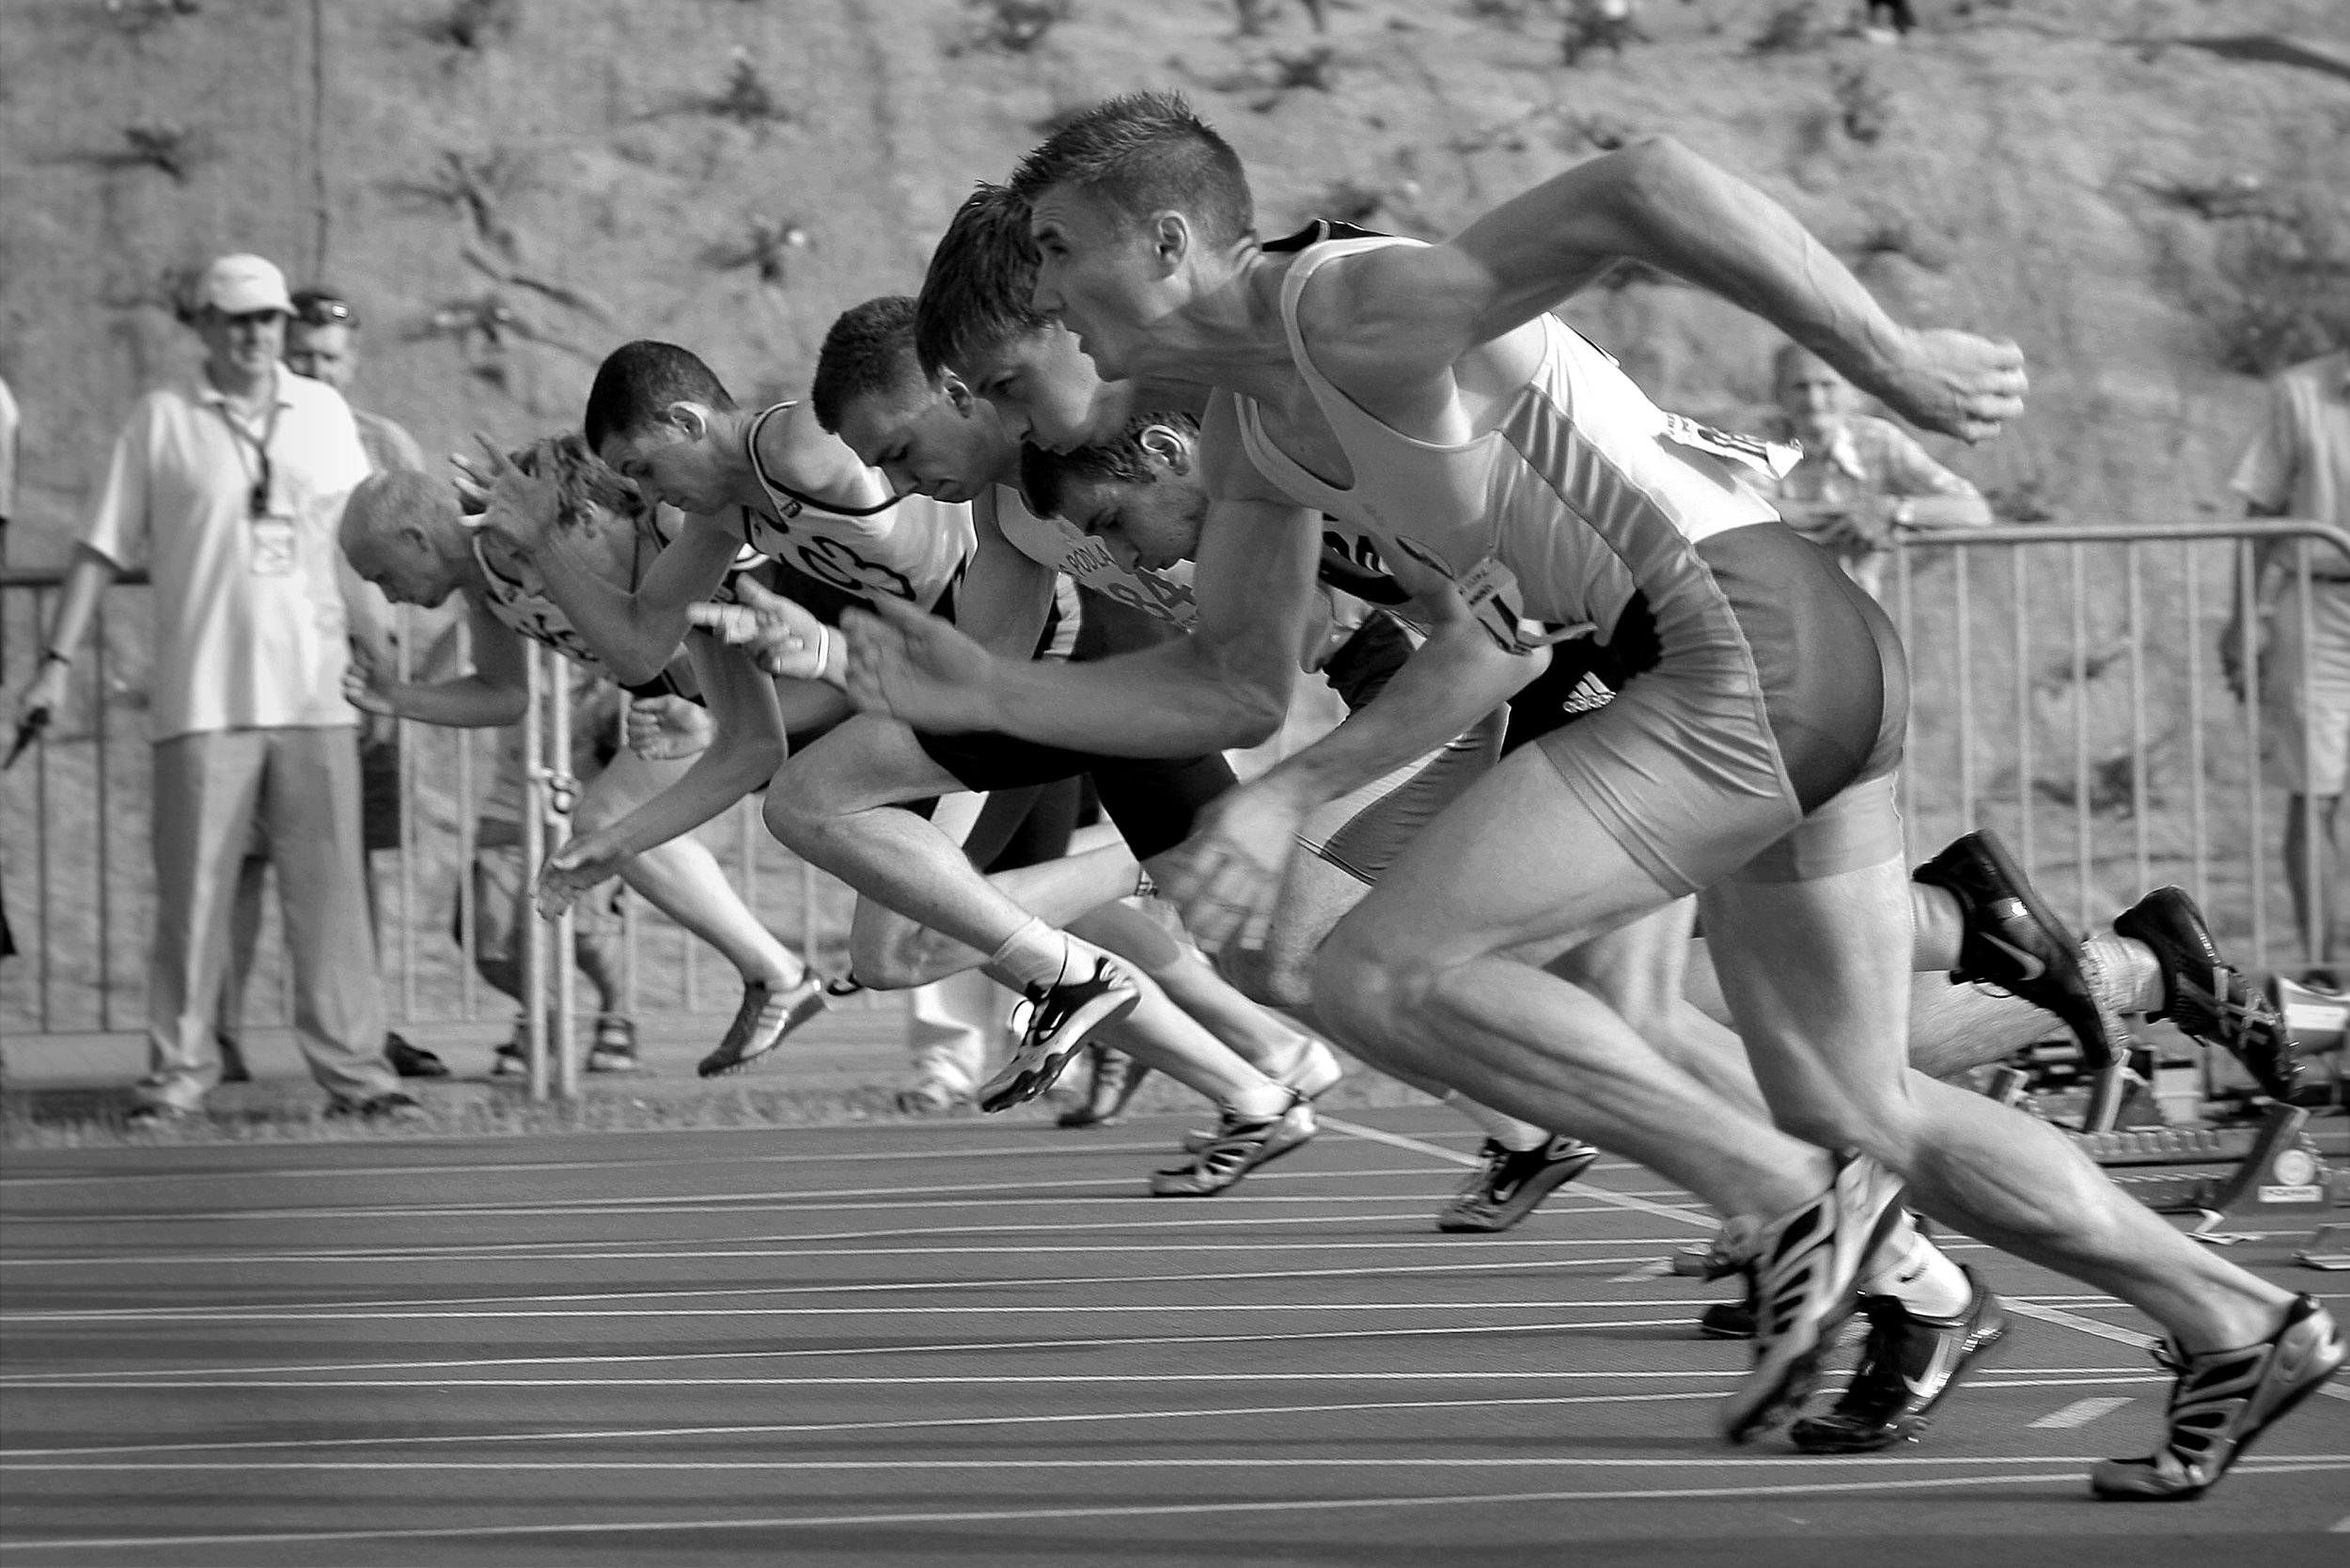 athletes-athletics-black-and-white-34514.jpg